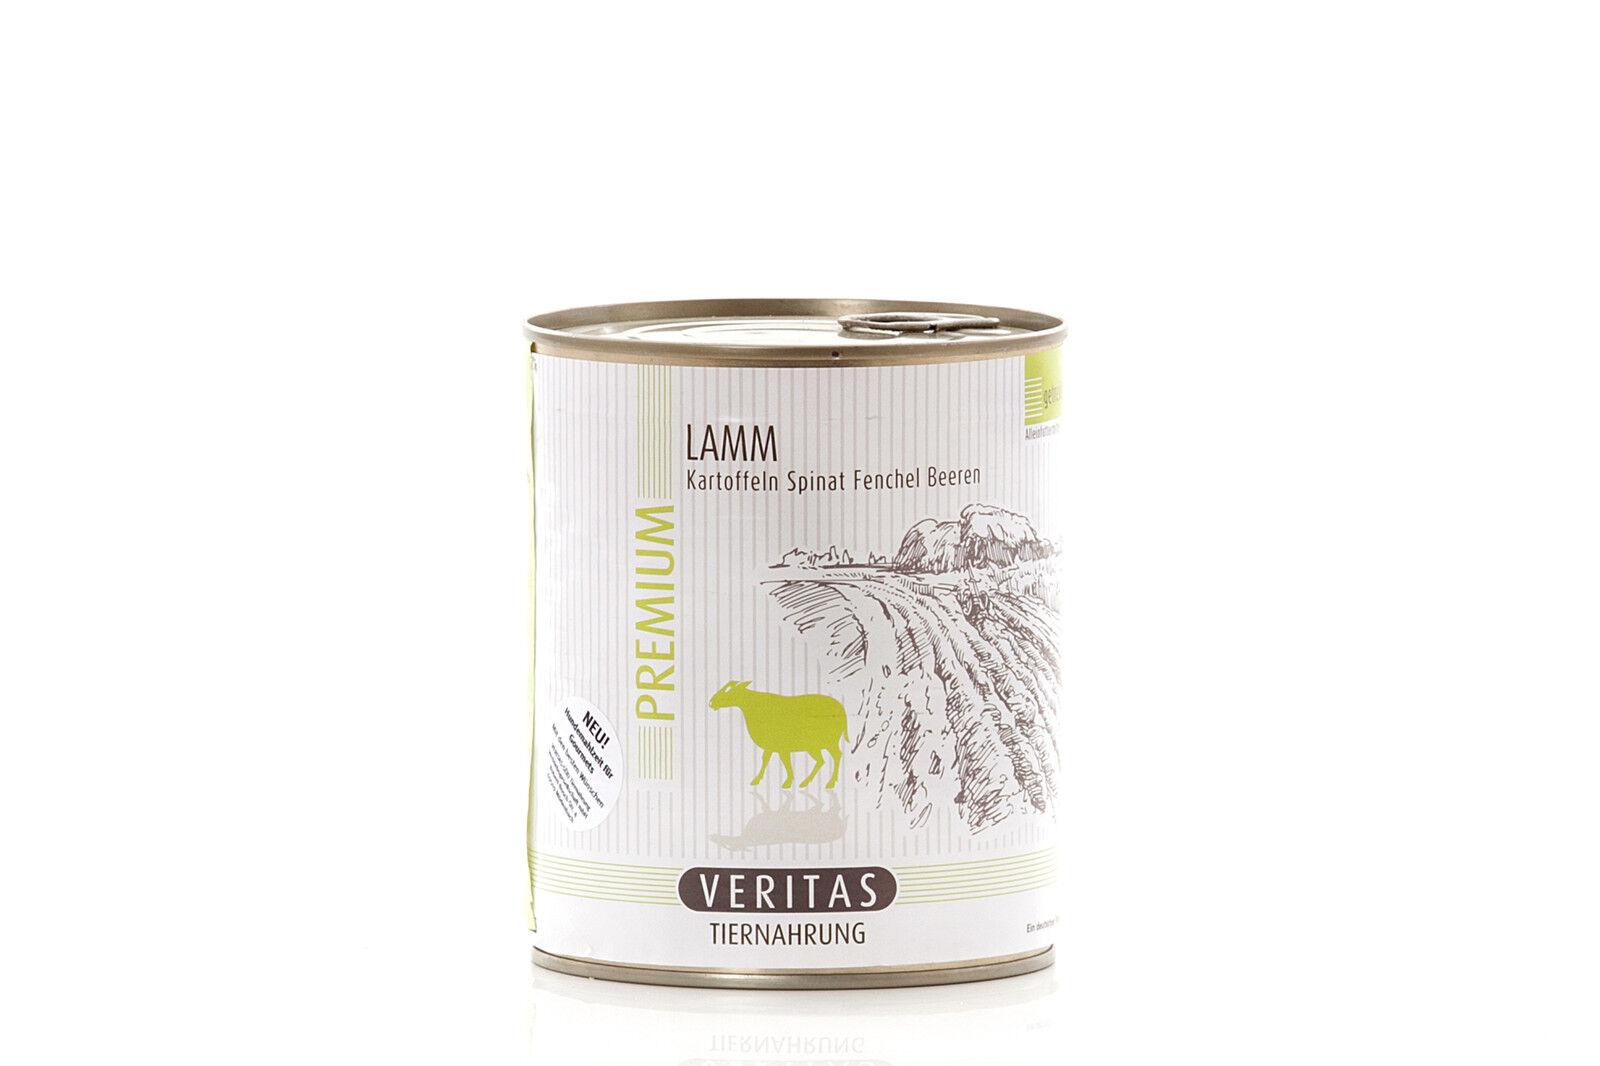 VERITAS Premium Hundefutter - - - Lamm Kartoffeln Spinat Fenchel Beeren 18x800g f4def7